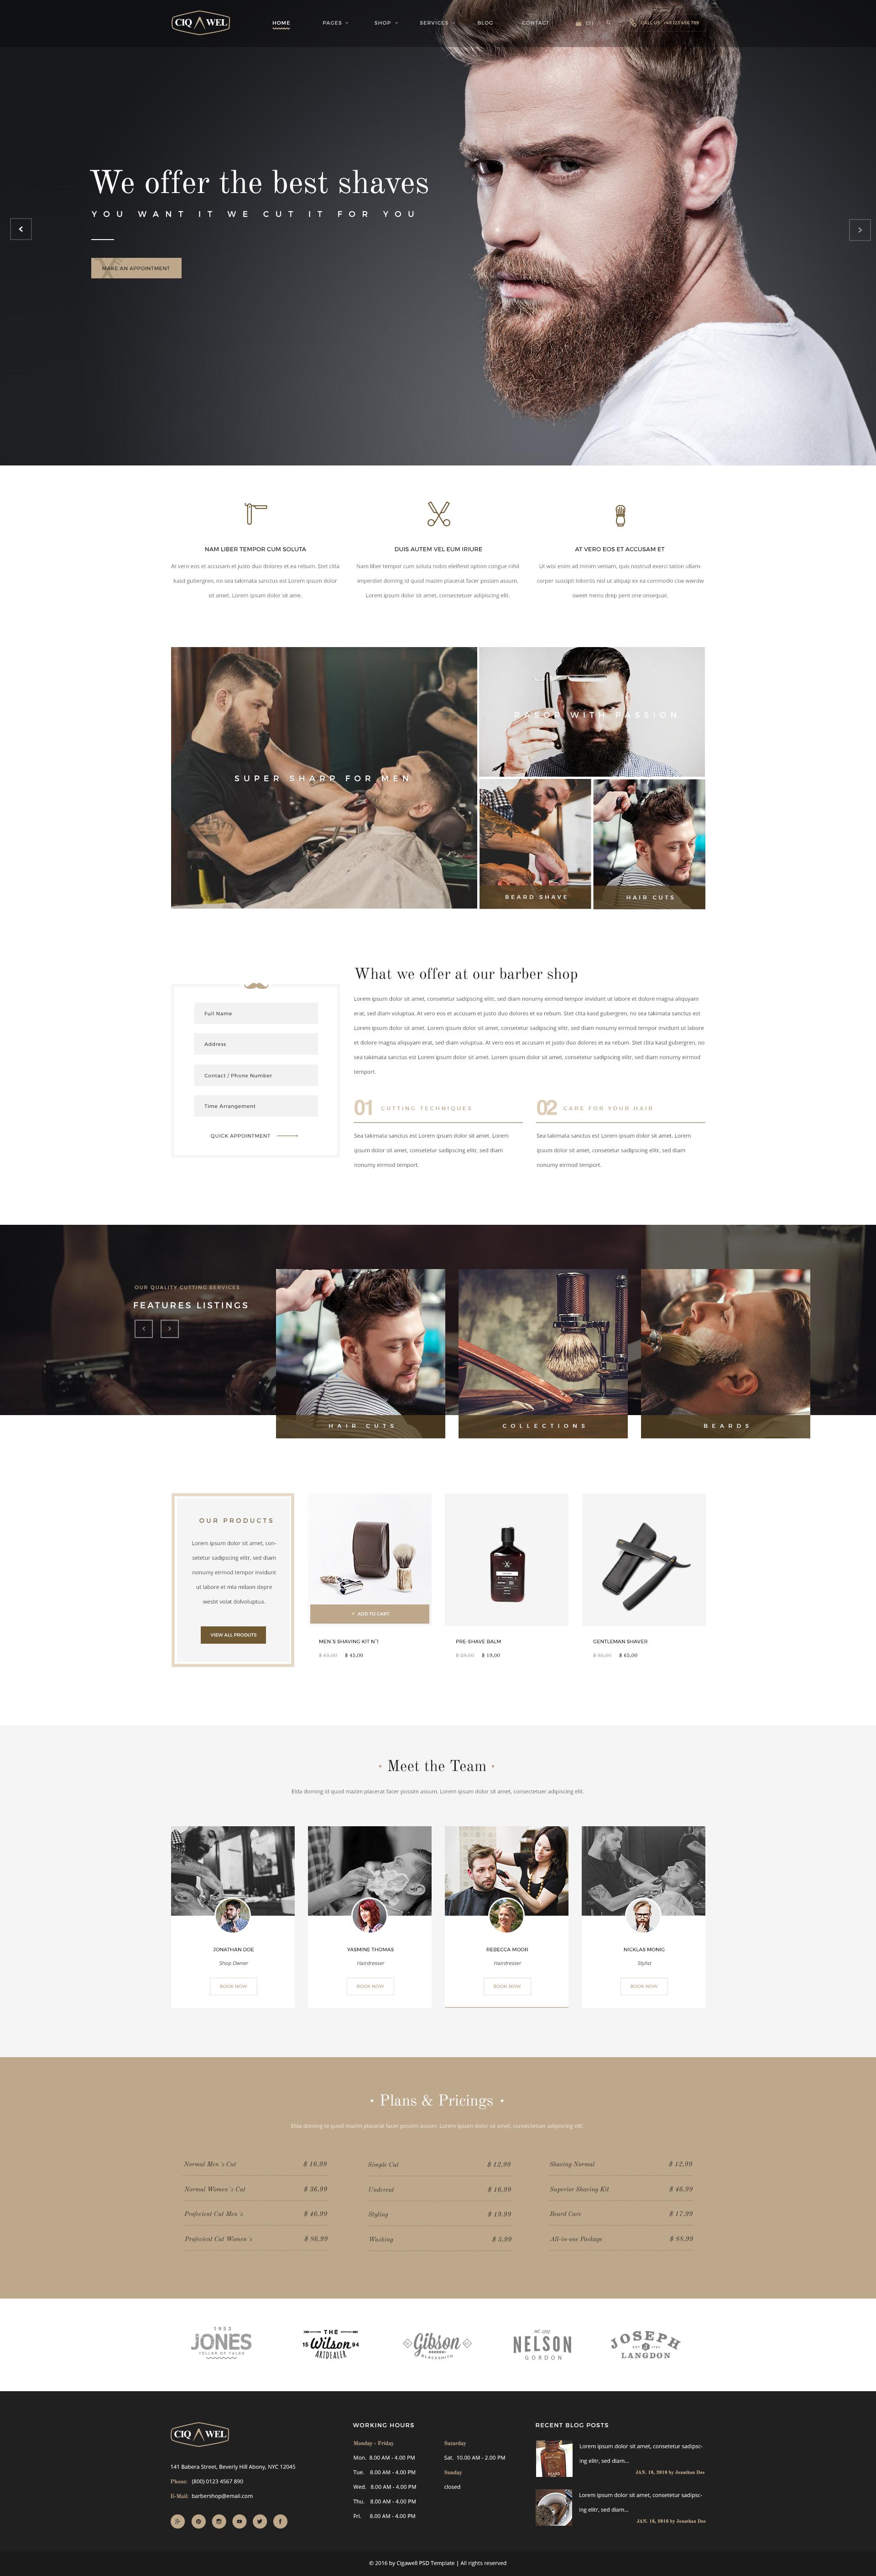 cigawel barbershop psd template by kl webmedia themeforest. Black Bedroom Furniture Sets. Home Design Ideas